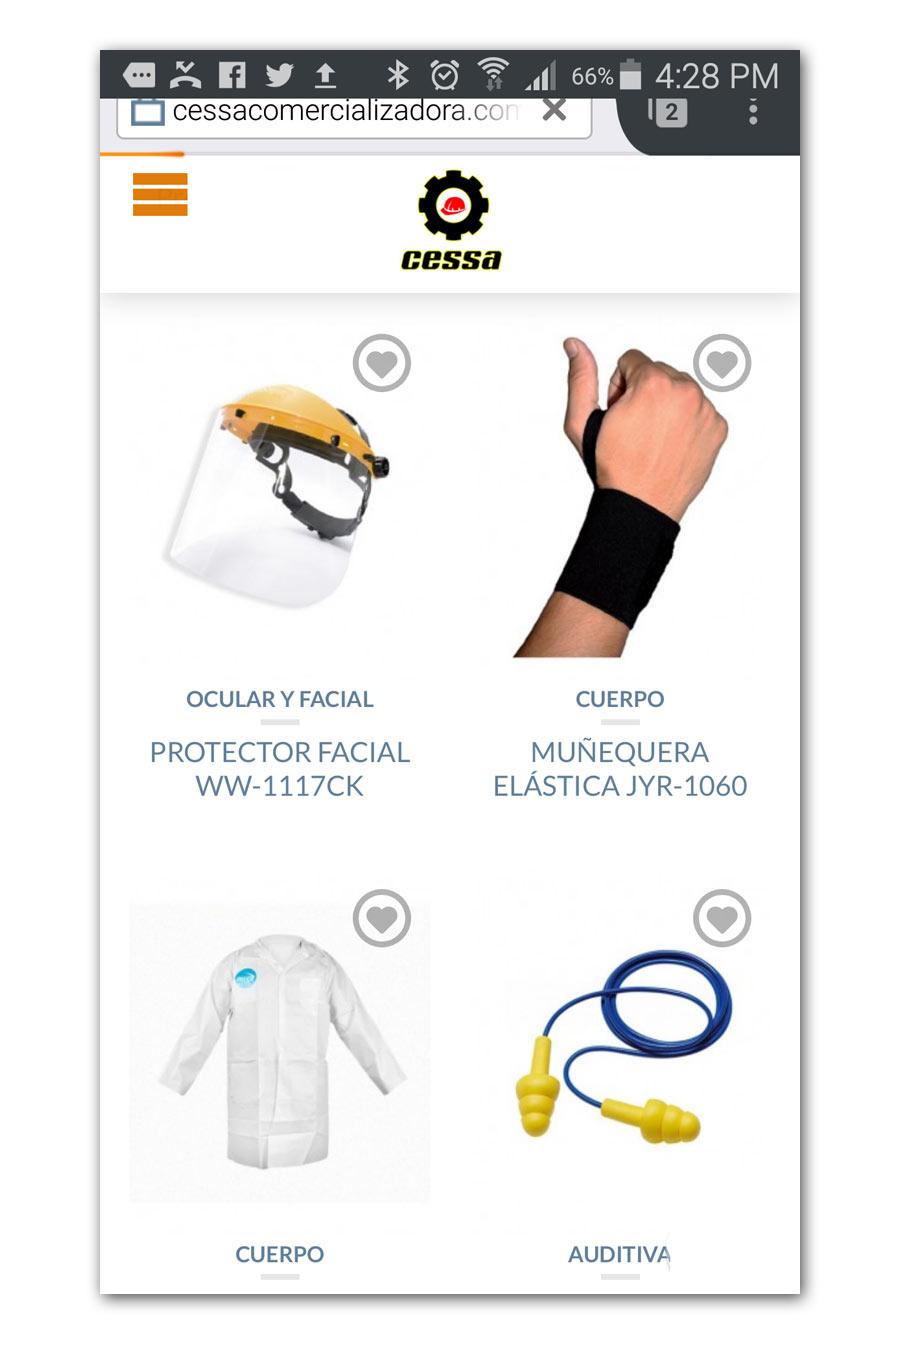 CESSA Comercializadora - Página Web - CreadoresWeb.mx